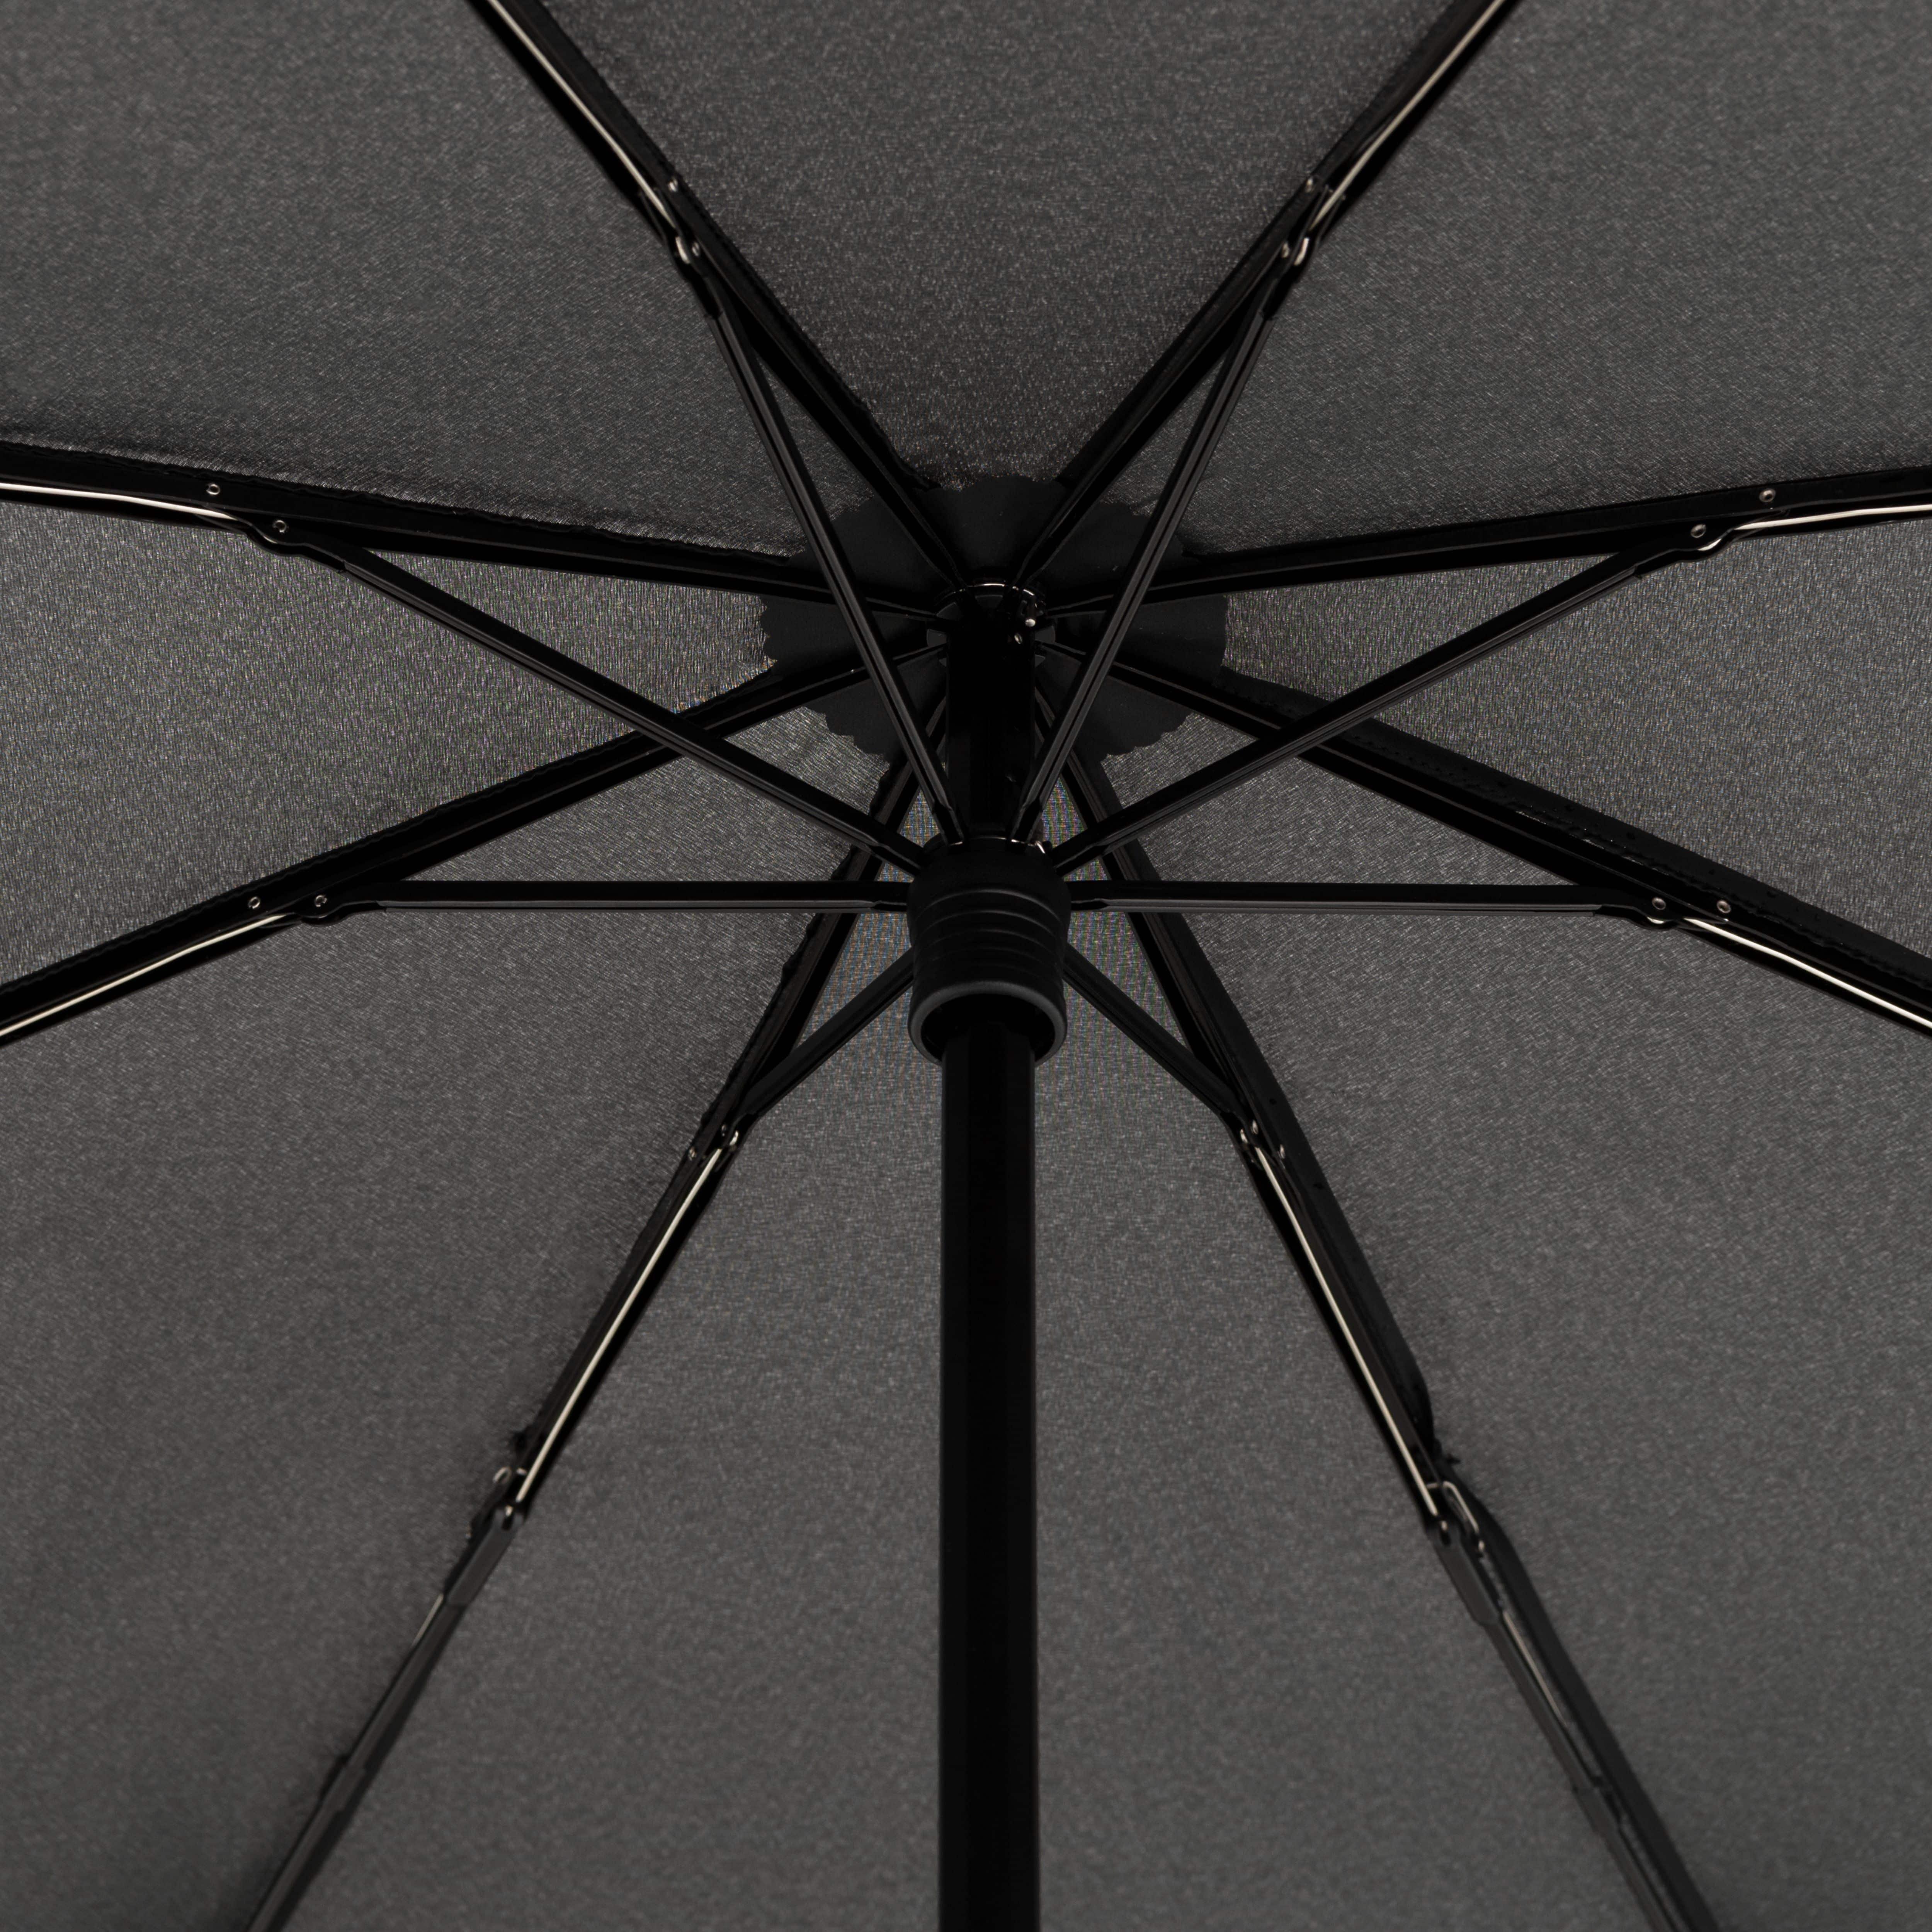 Knirps Umbrella U.090 Ultra Light XXL Manual Compact - foto 6